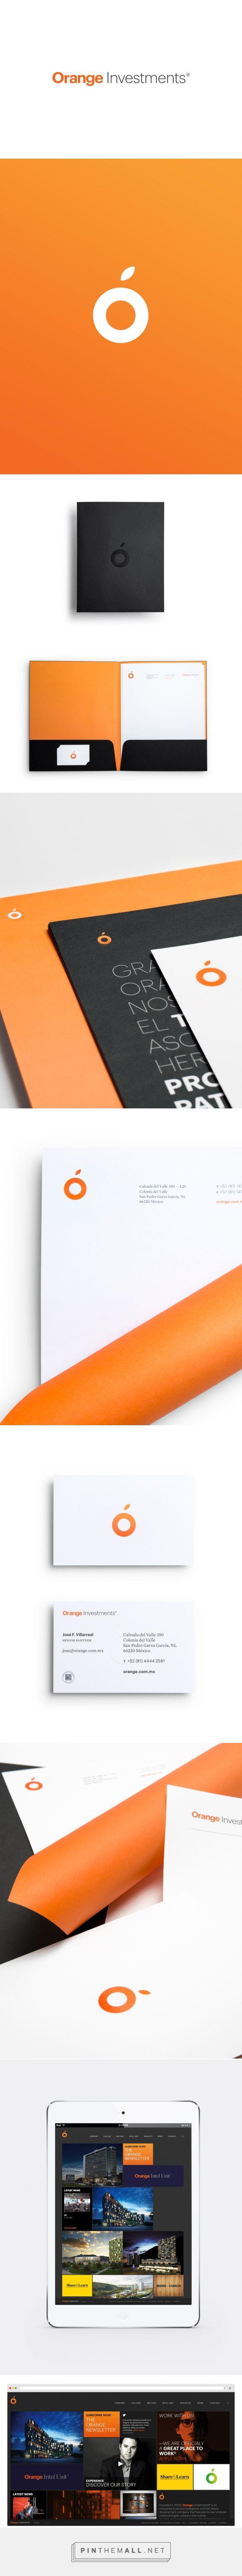 Orange Investments Branding by Face | Fivestar Branding – Design and Branding Agency & Inspiration Gallery